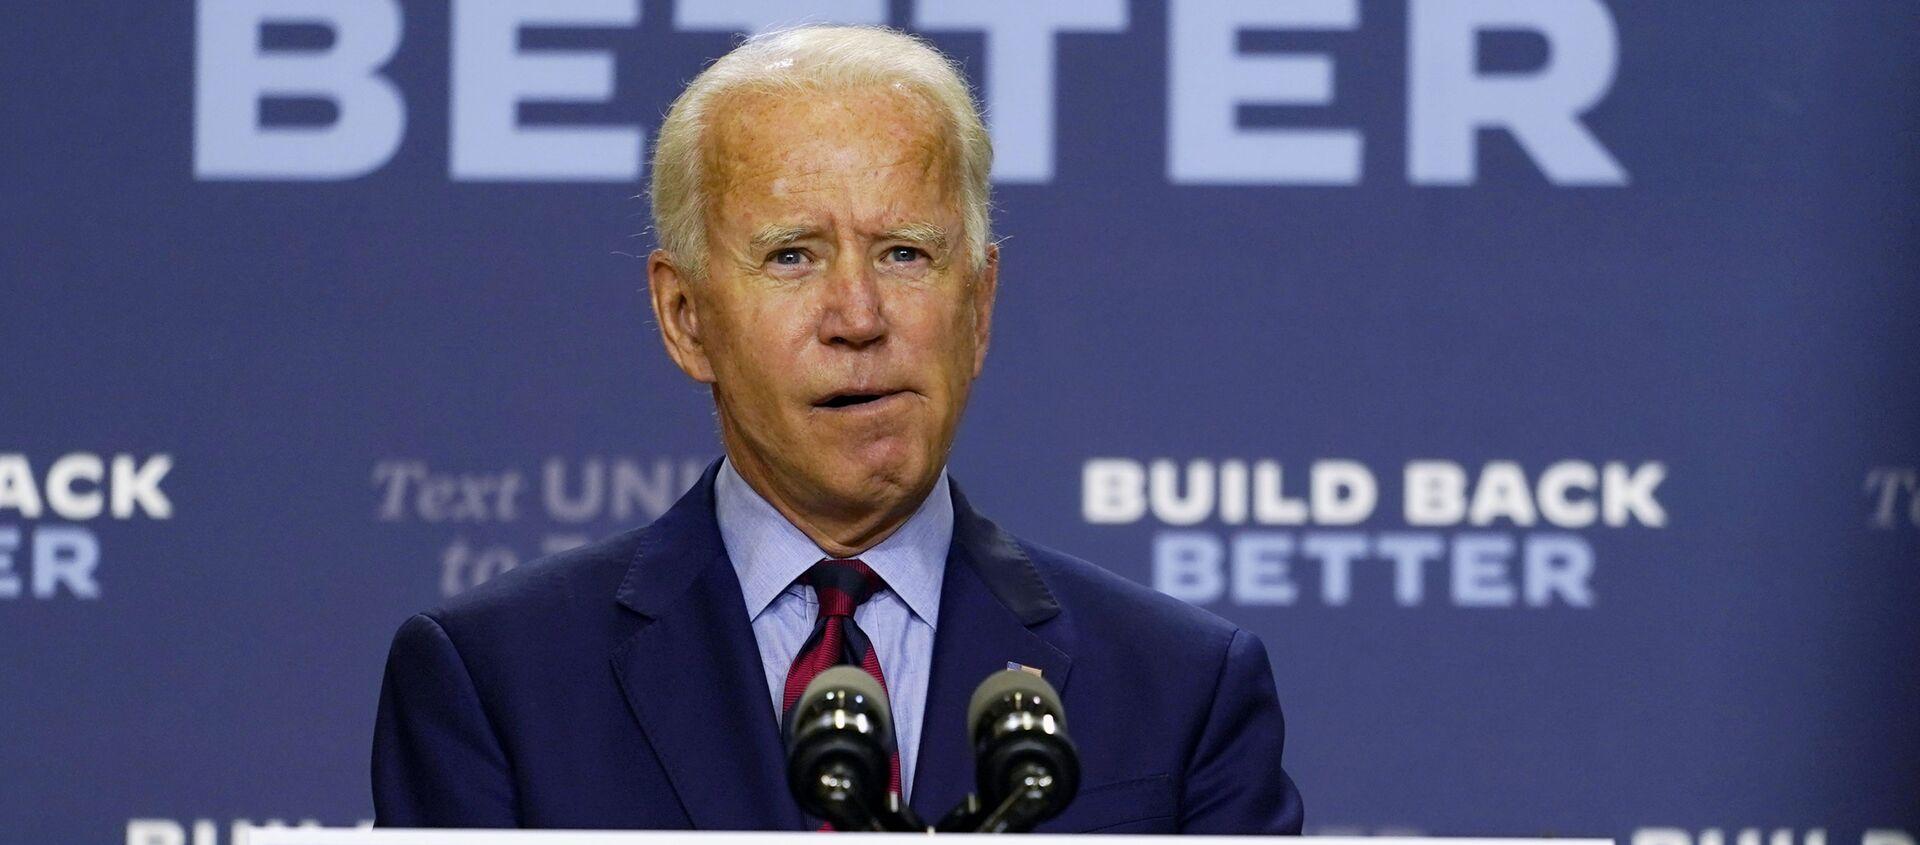 Democratic presidential candidate former Vice President Joe Biden speaks about the economic crisis in Wilmington, Del., 4 September 2020 - Sputnik International, 1920, 21.09.2020